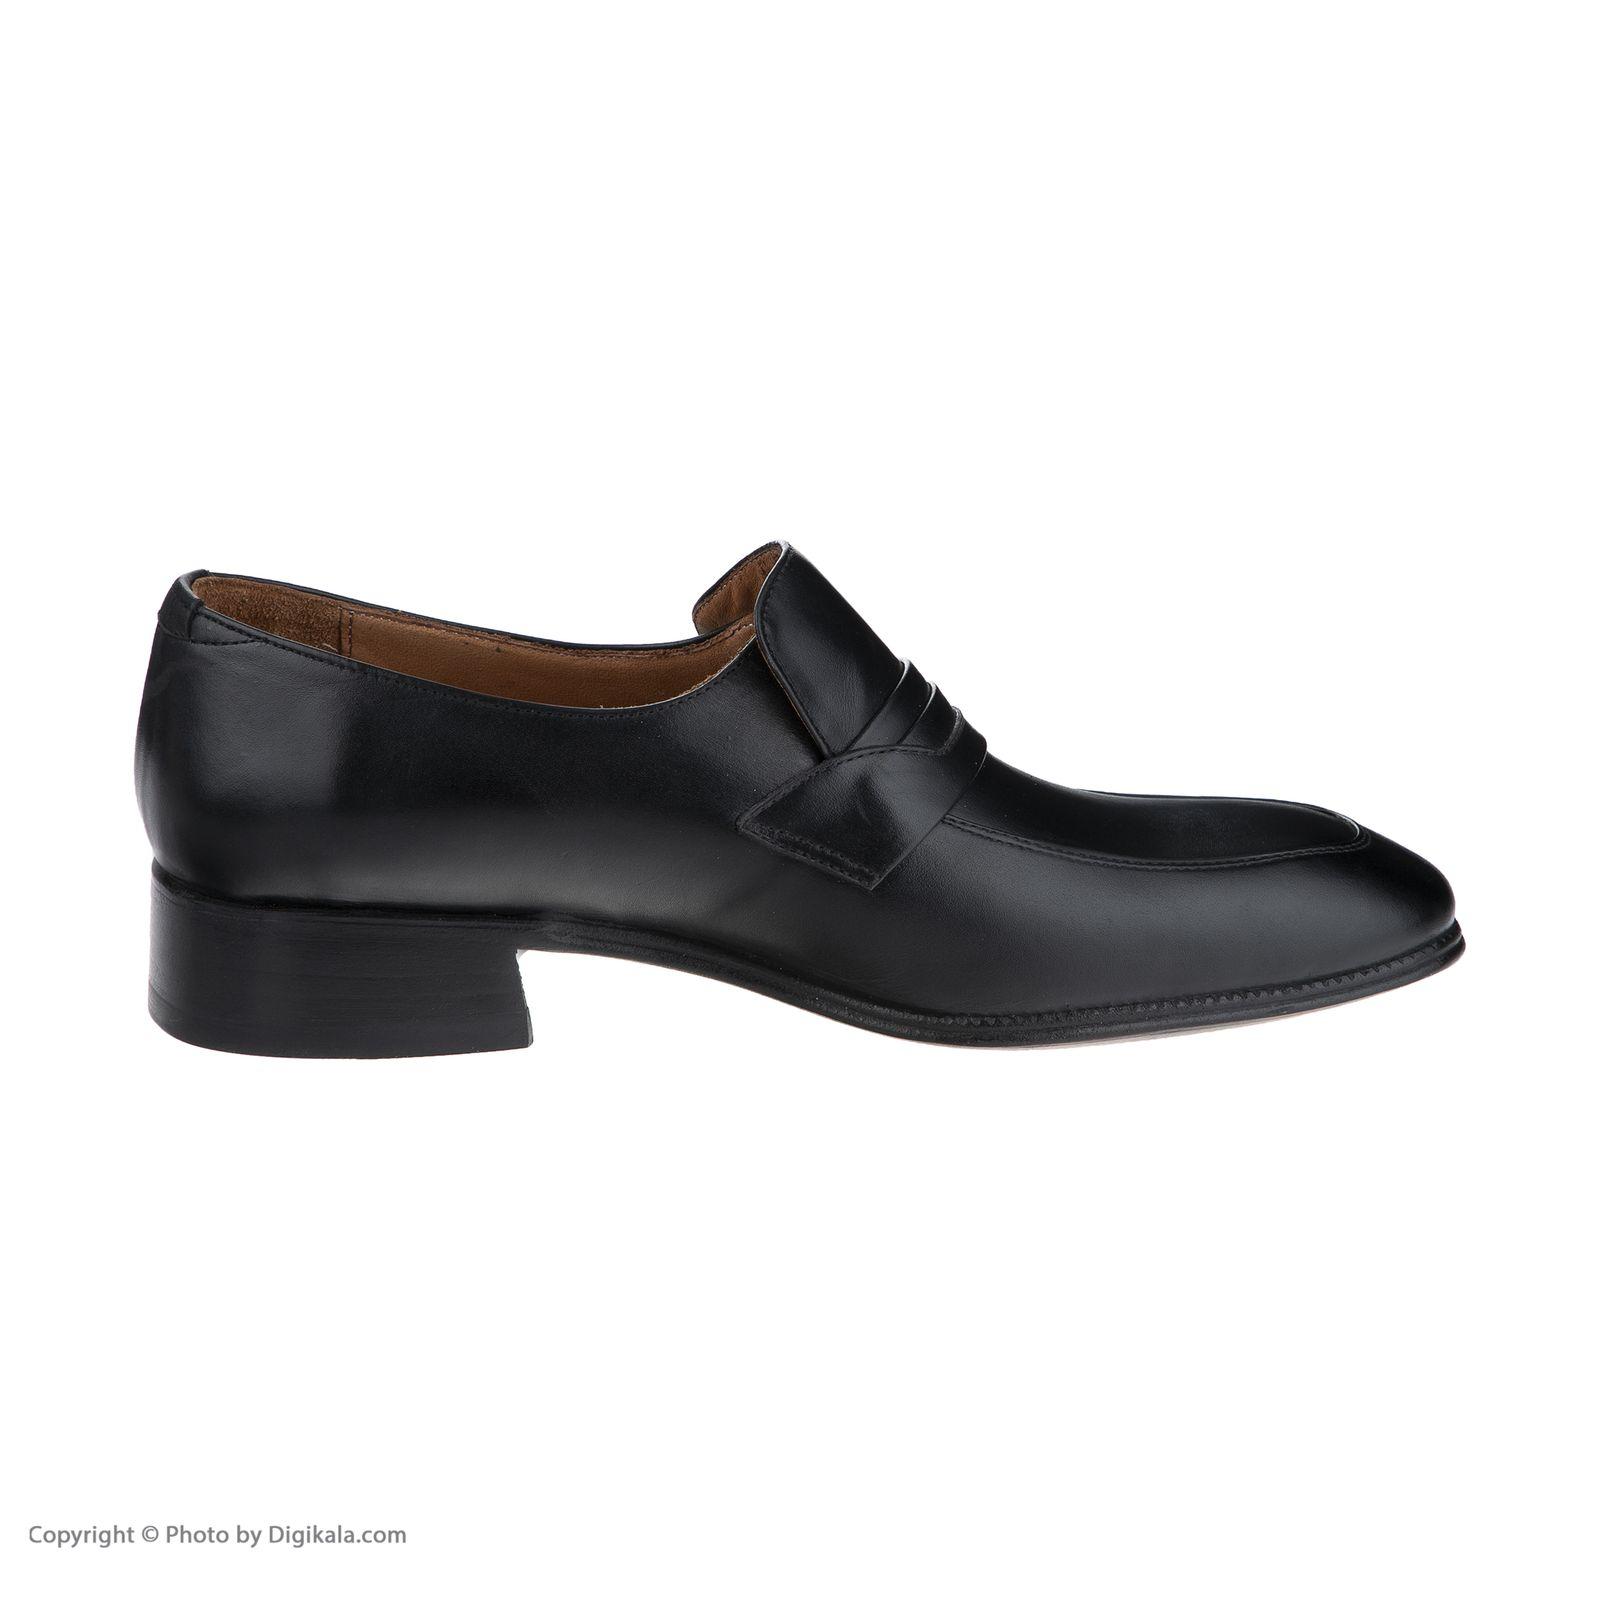 کفش مردانه نظری کد 416 -  - 2